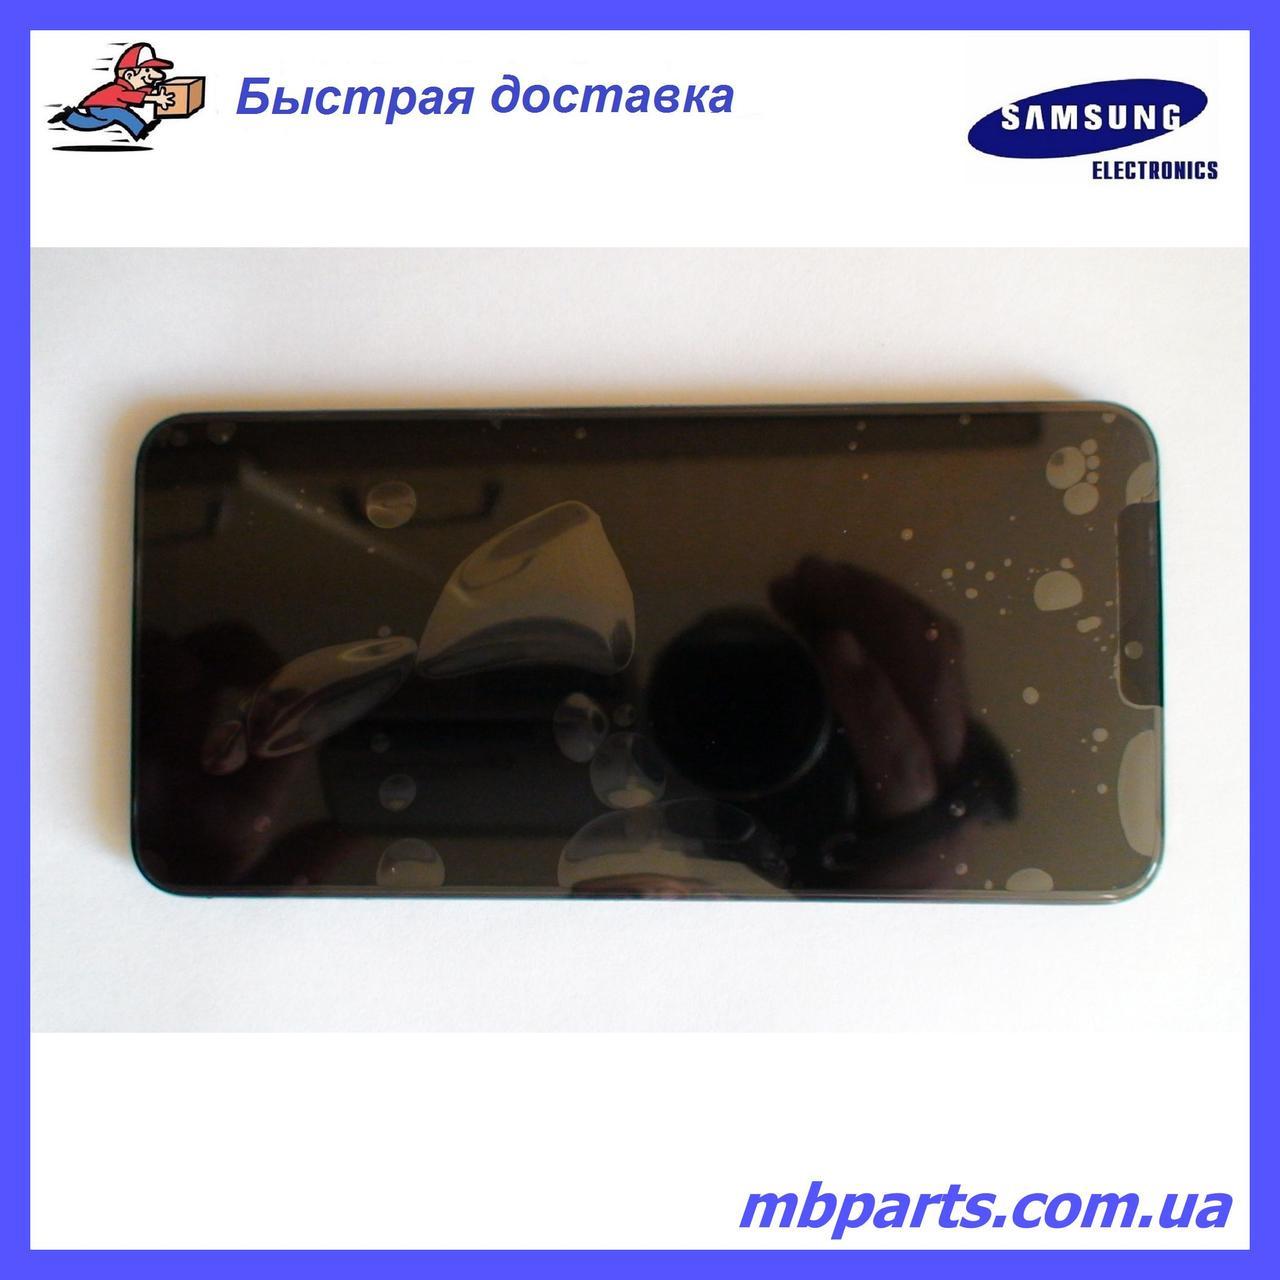 Дисплей с сенсором Samsung A105 Galaxy A10 Black, GH82-19367A, оригинал!